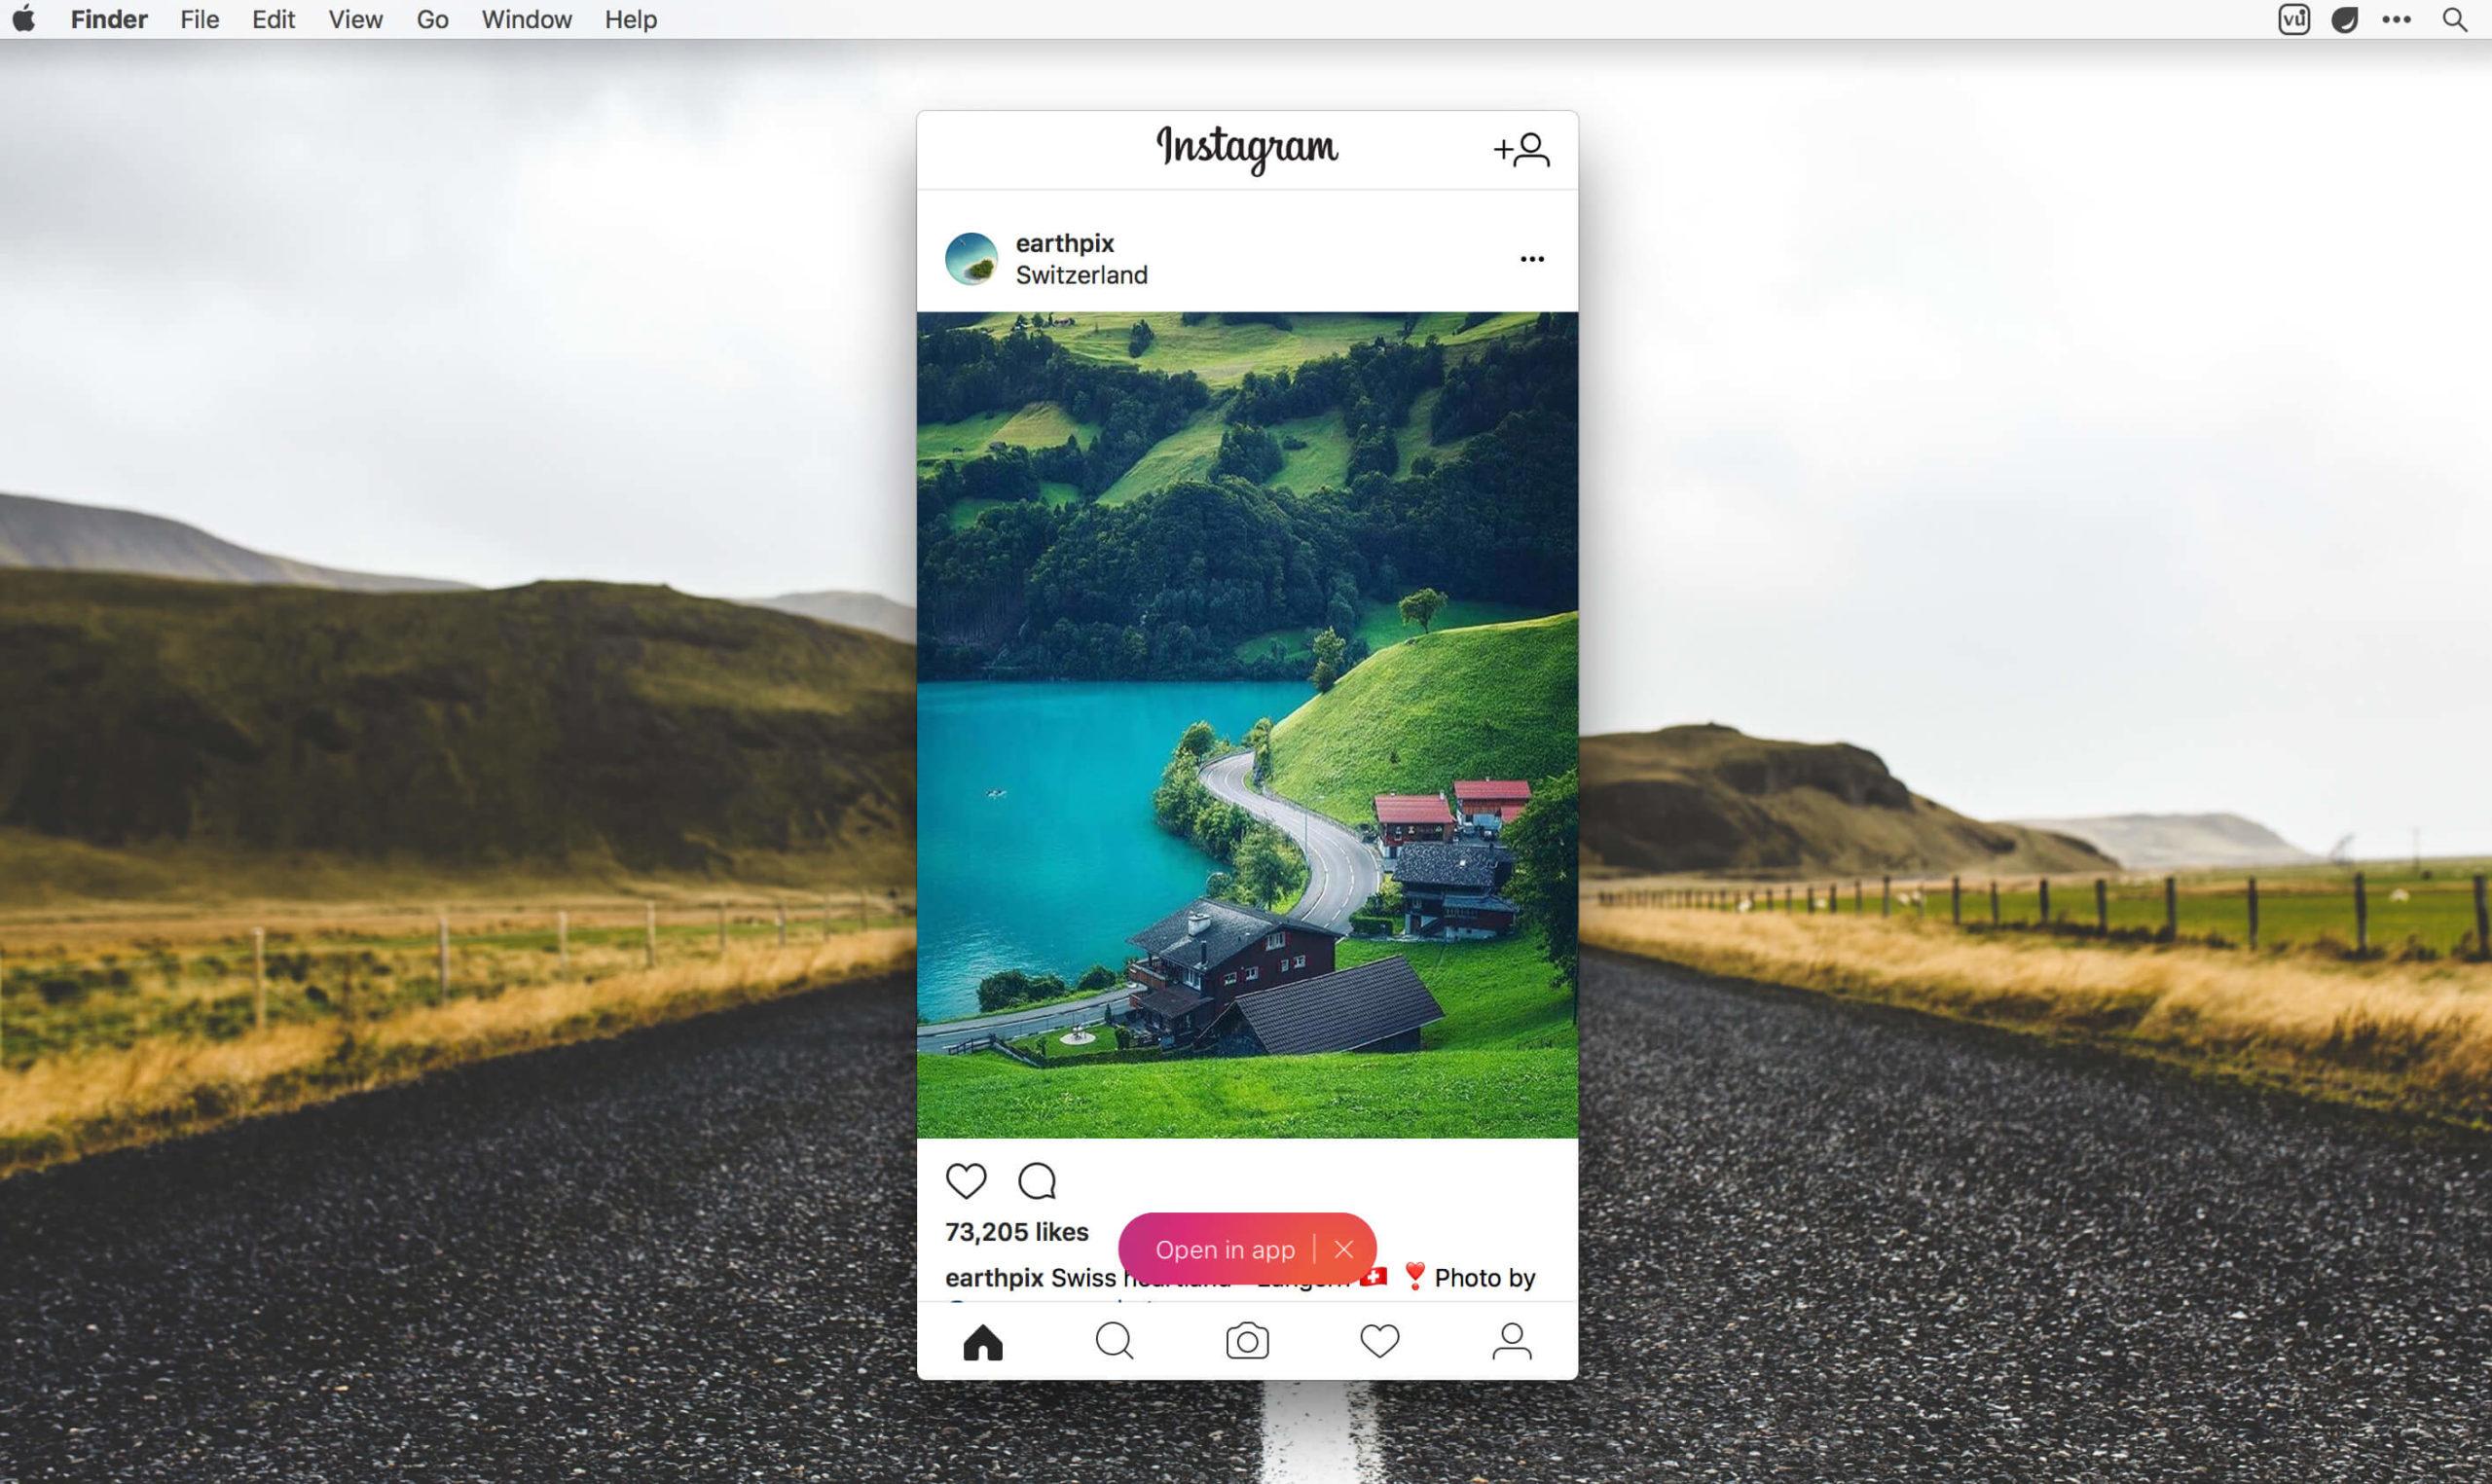 Vu Instagram app for desktop - manage multiple Instagram accounts